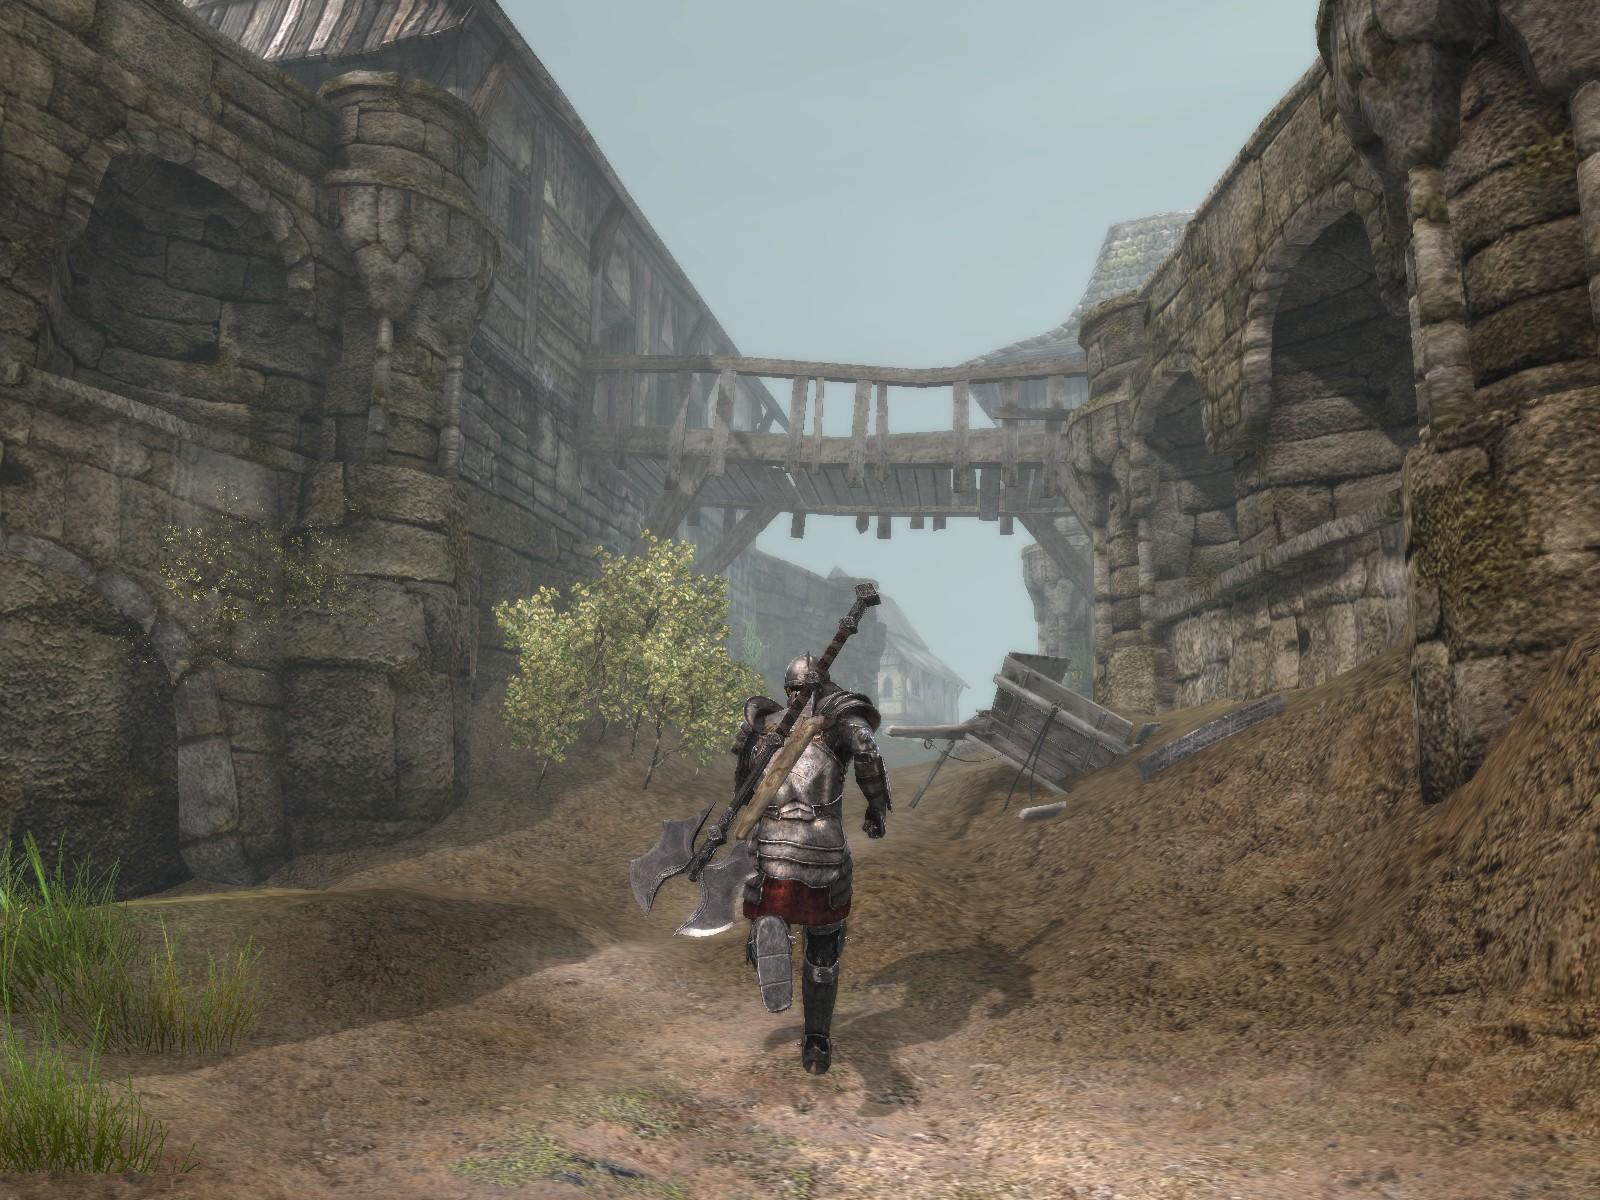 http://www.pcgameshardware.com/screenshots/original/2009/06/arcania-2.jpg